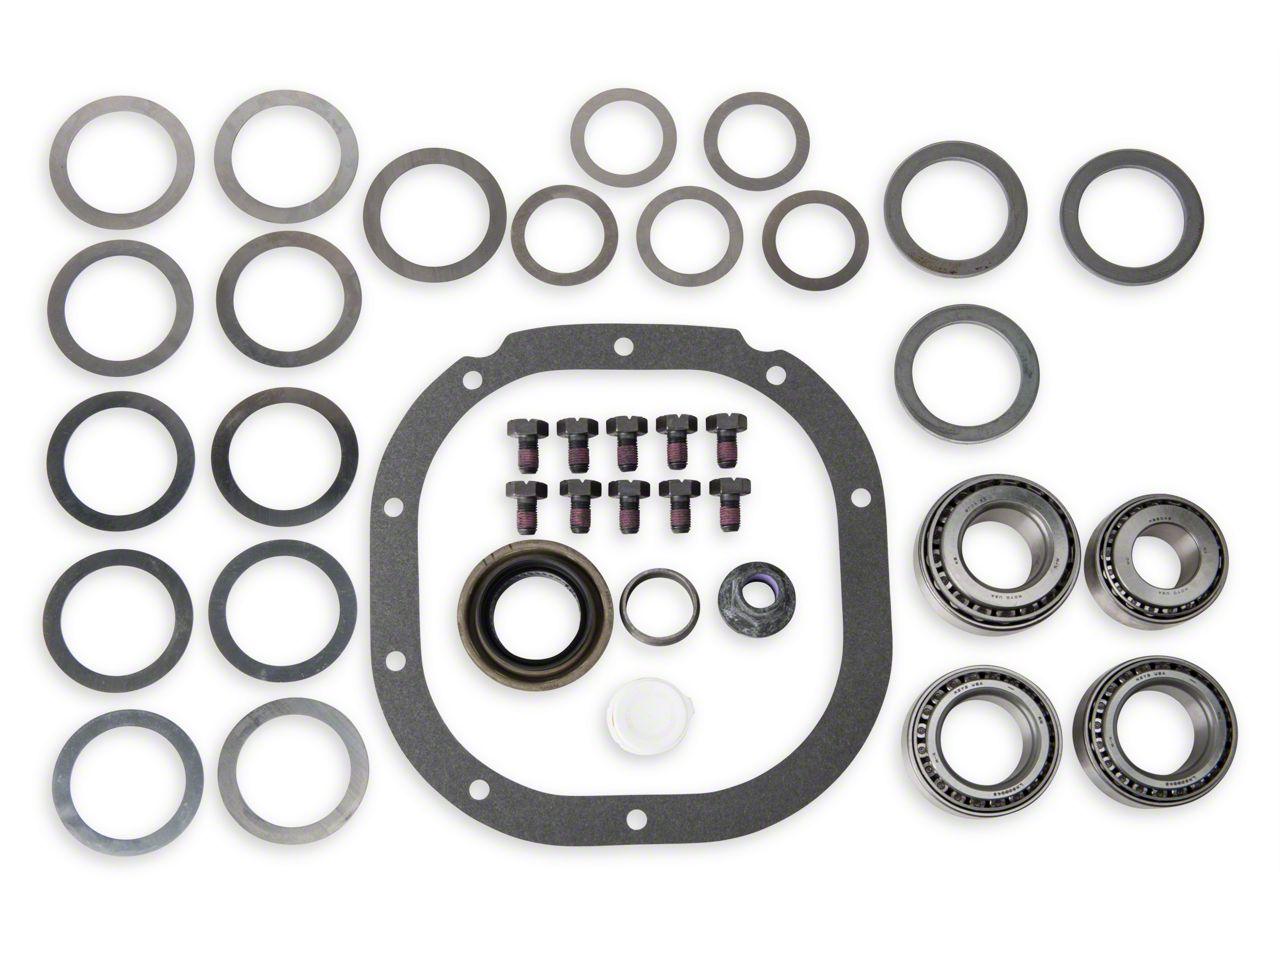 Add Ford Performance Ring & Pinion Installation Kit w/ High Torque Bearing - 8.8 in. (86-14 V8, 99-04 Cobra, 11-14 V6)